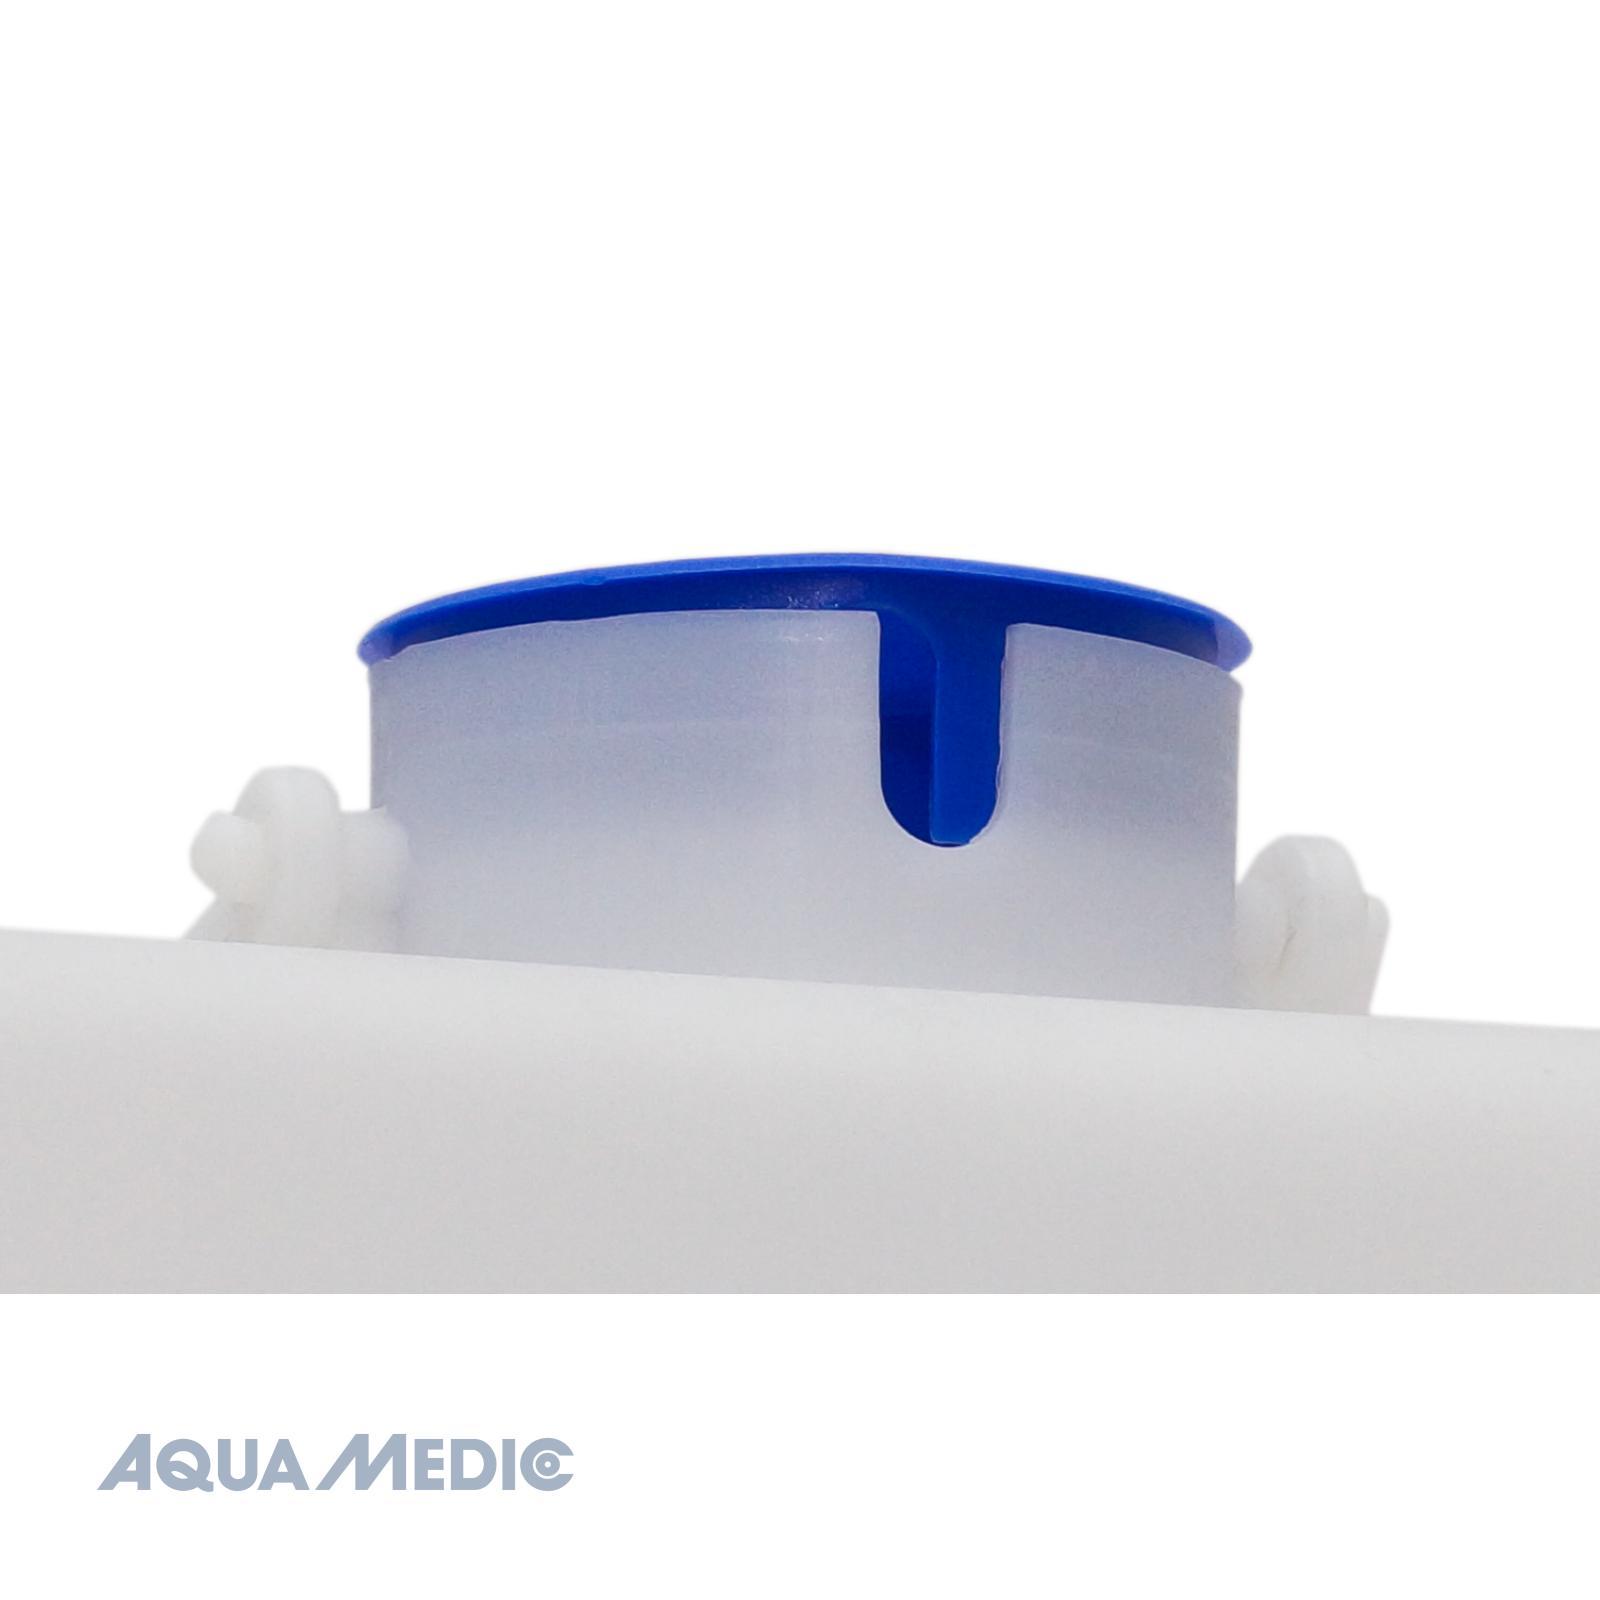 aqua medic refill depot 16l versie1 uitspraring